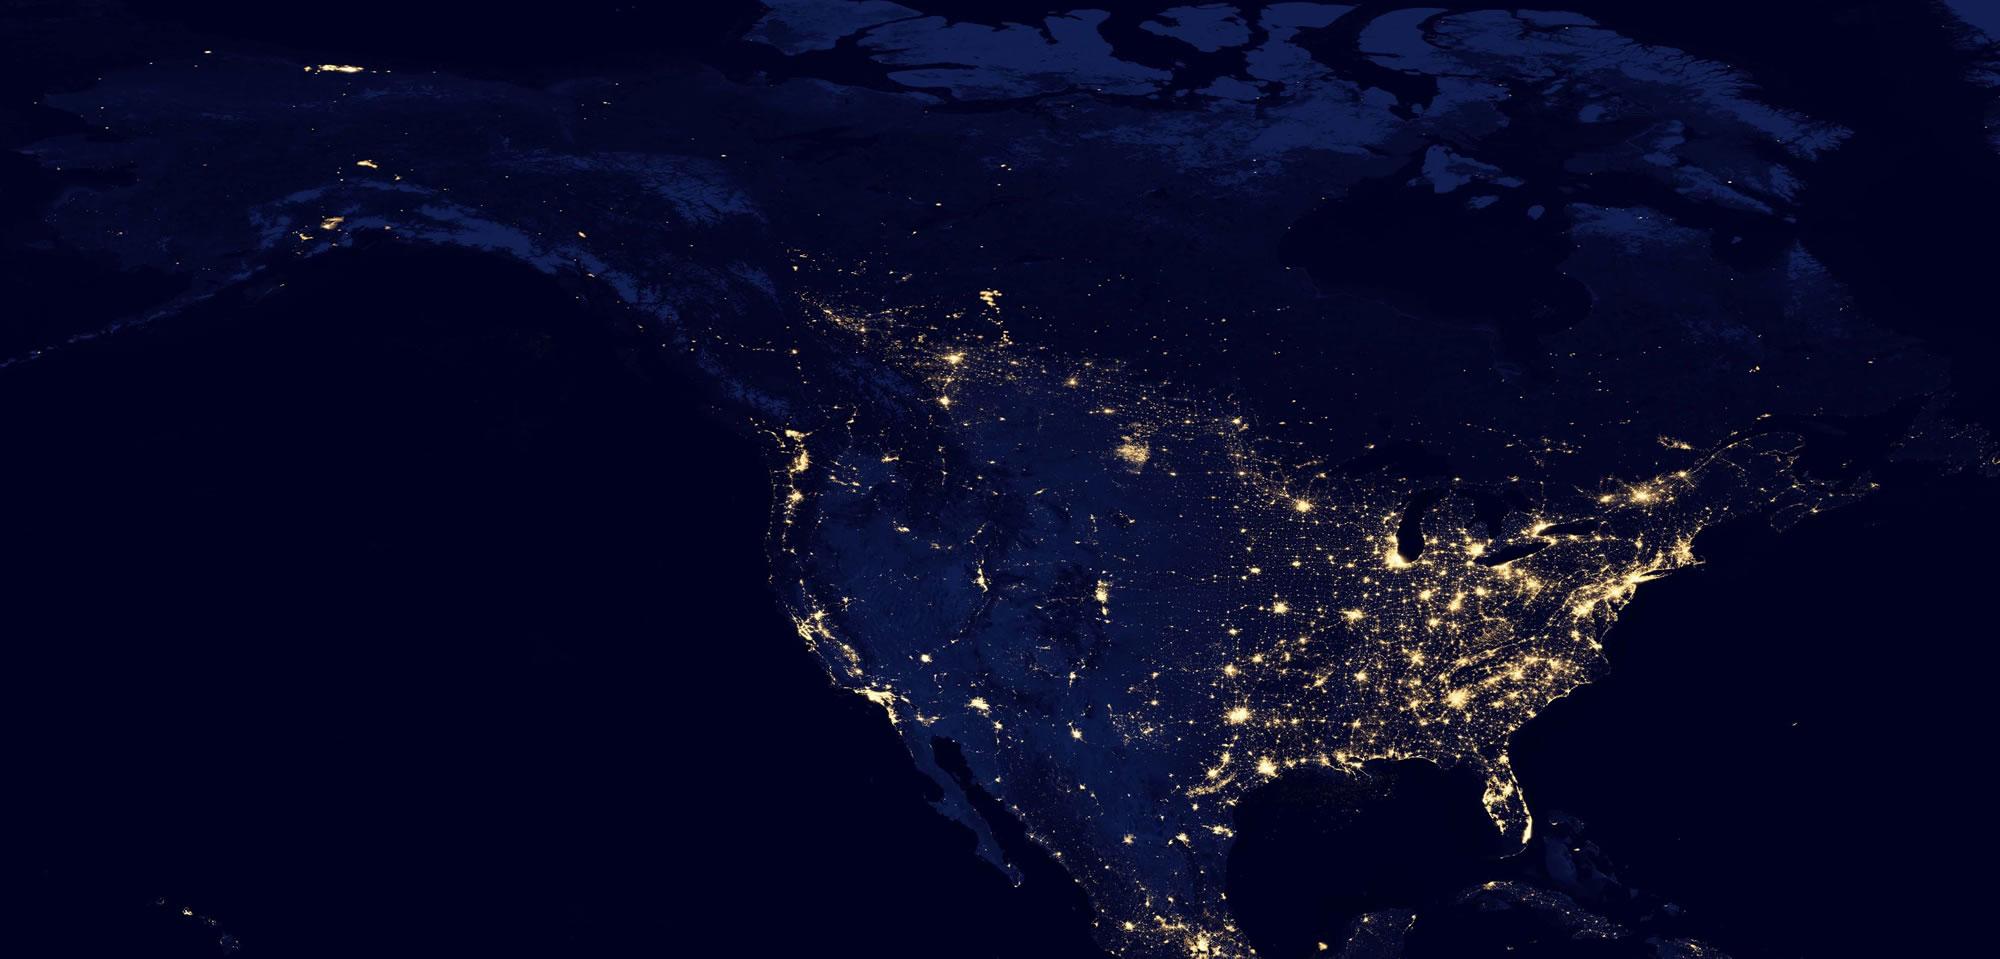 satellite-photo-united-states-at-night-lg